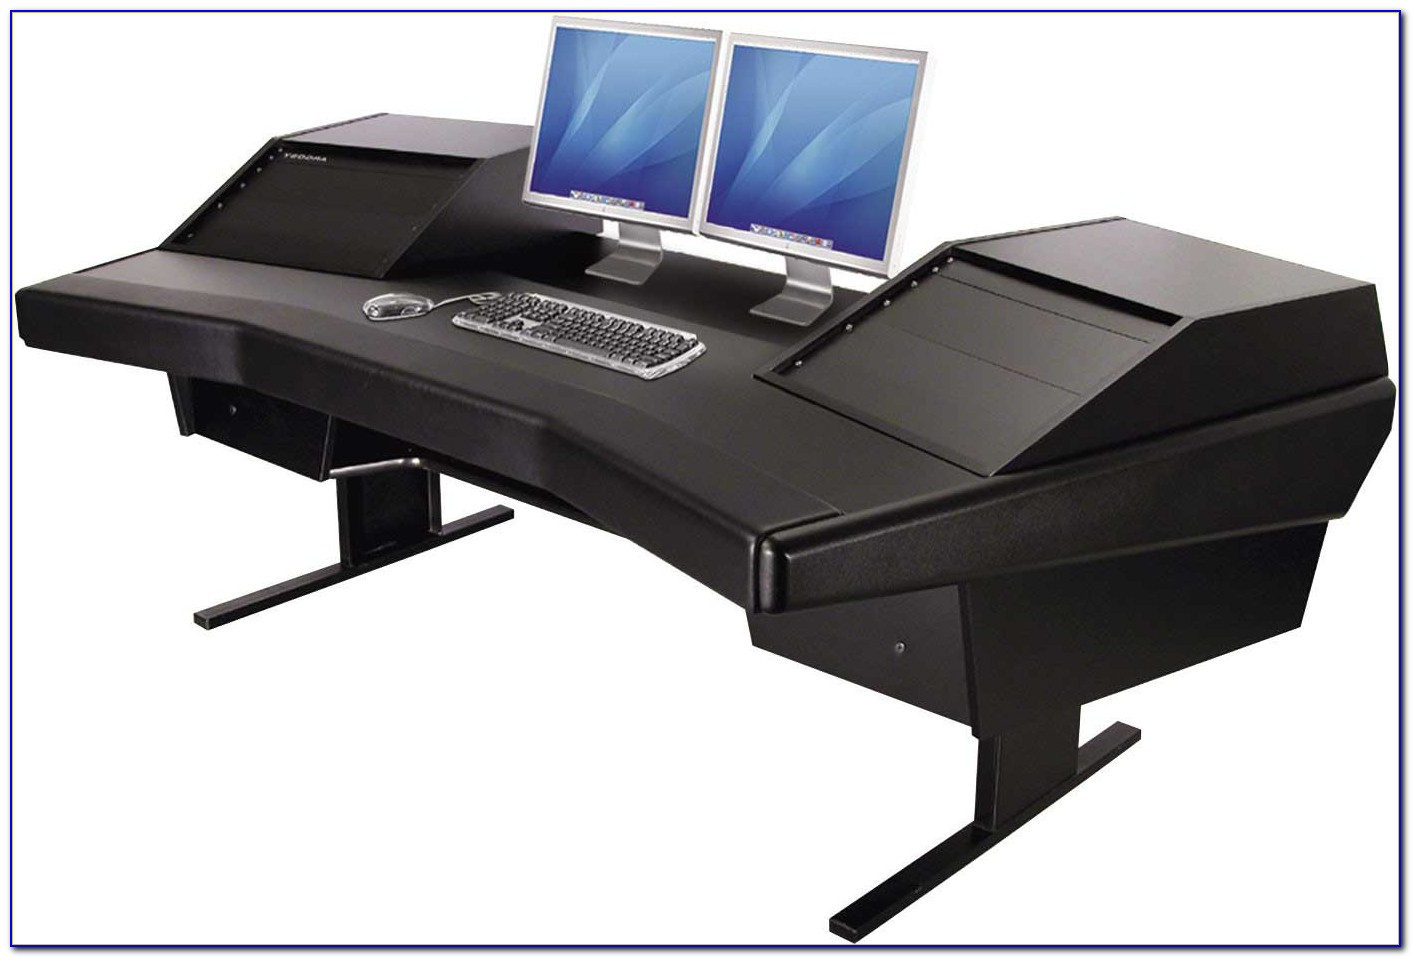 Computer Desks For Dual Monitors  Desk  Home Design. Cute Desk Pad. Butcher Block Table Top. Table Casters. Slanted Writing Desk. Itil Service Desk Organizational Structures. Drawer Cabinets Wood. Posture Rite Lap Desk. Black Leather Desk Mat